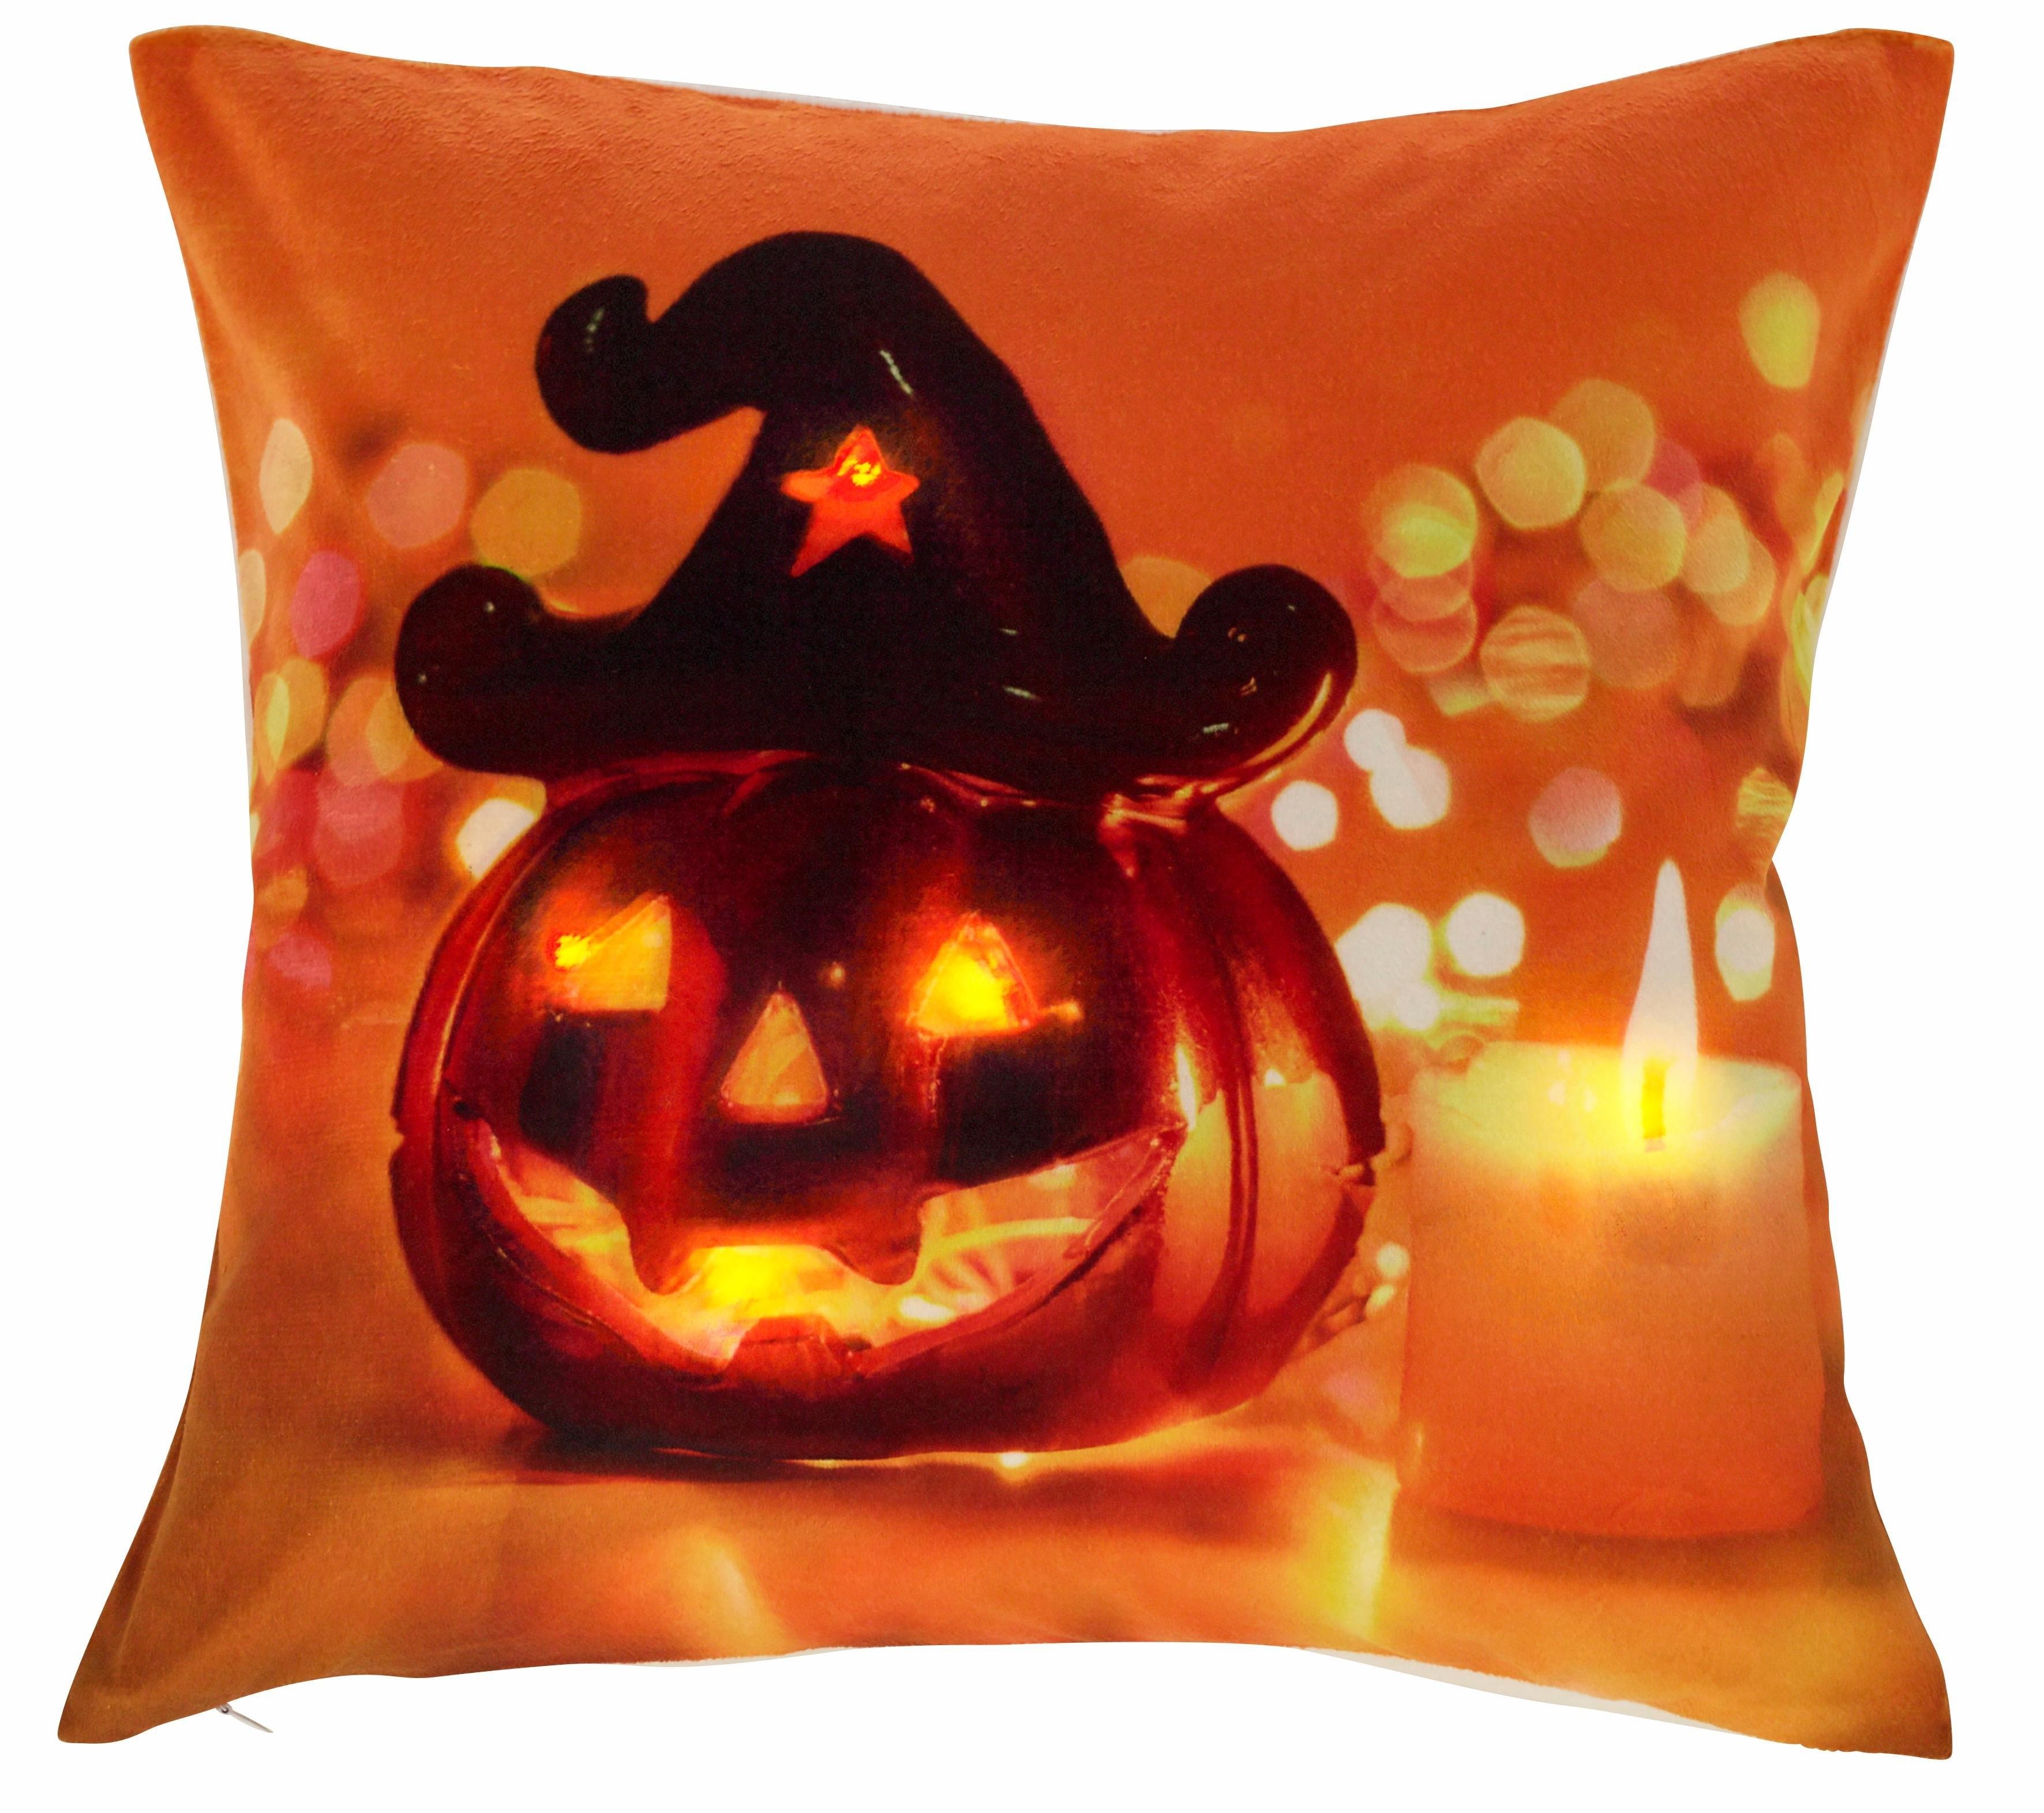 My Home LED-kussenovertrek, 'Pumpkin' (per stuk) nu online bestellen